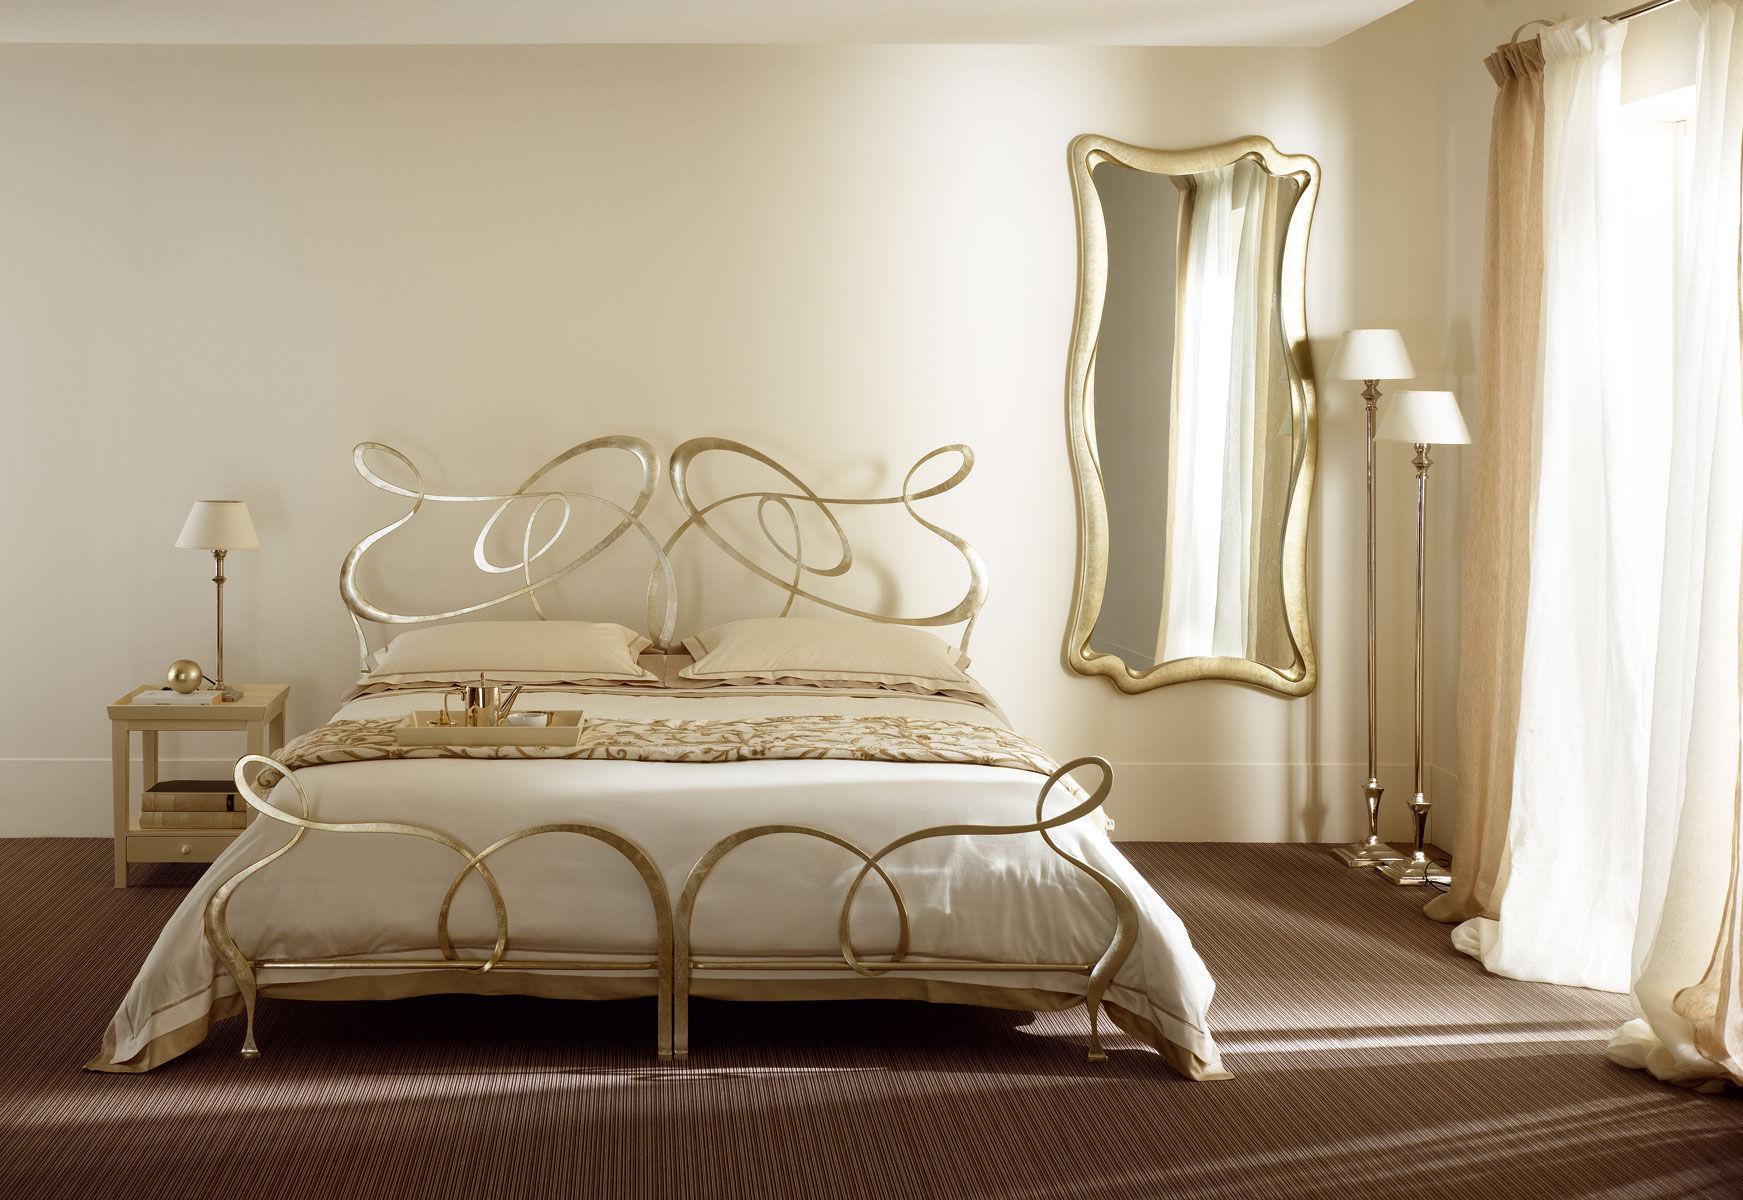 بالصور ديكورات غرف نوم , تصميمات مودرن للمنزل 523 4